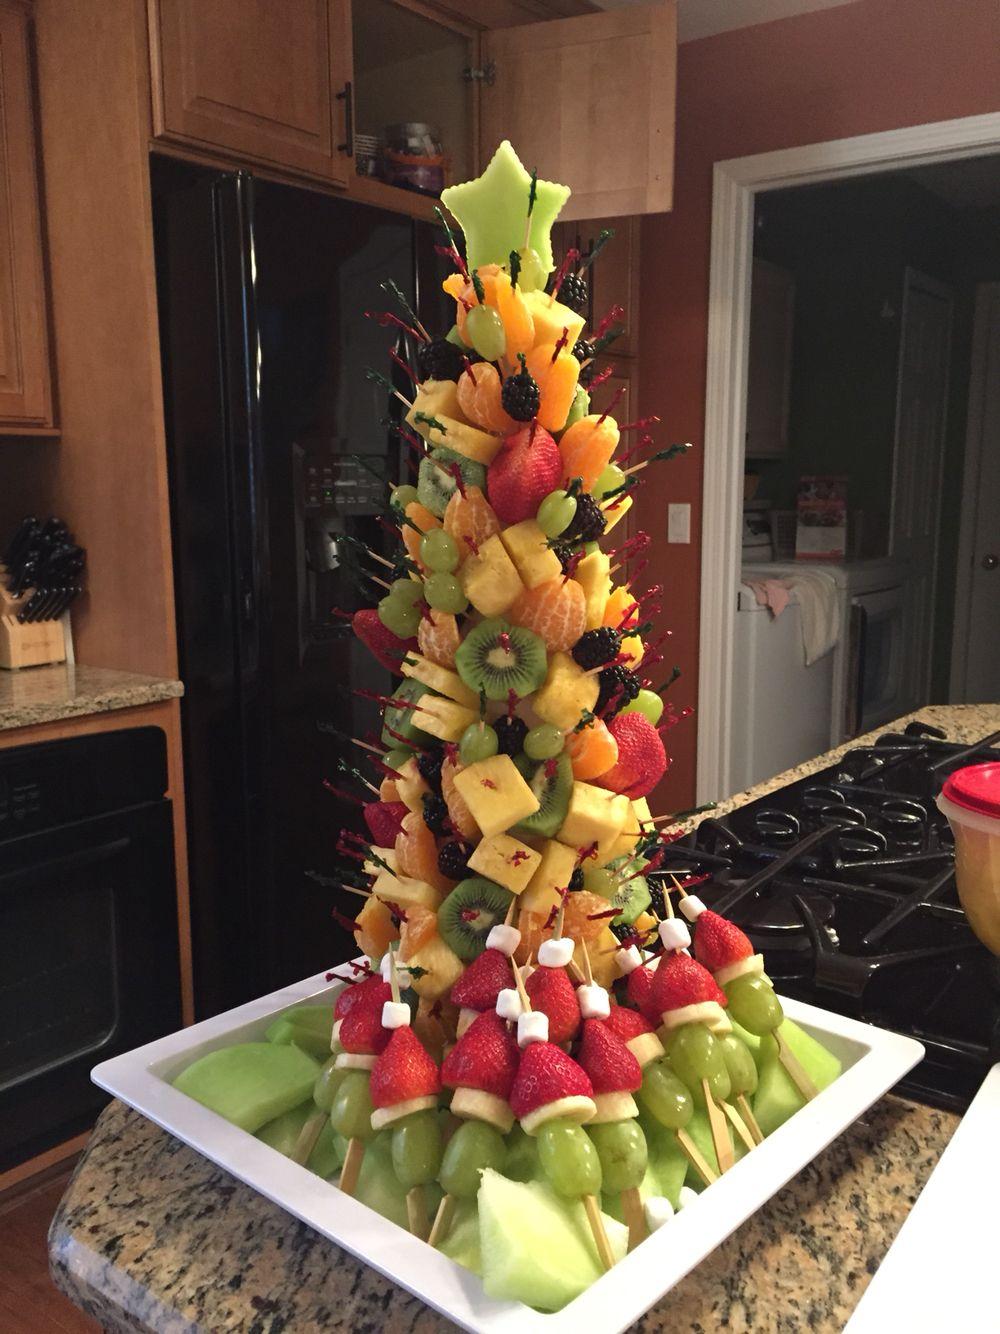 Christmas Tree Fruit Platter.Christmas Tree Fruit Platter Is So Simple And Cute